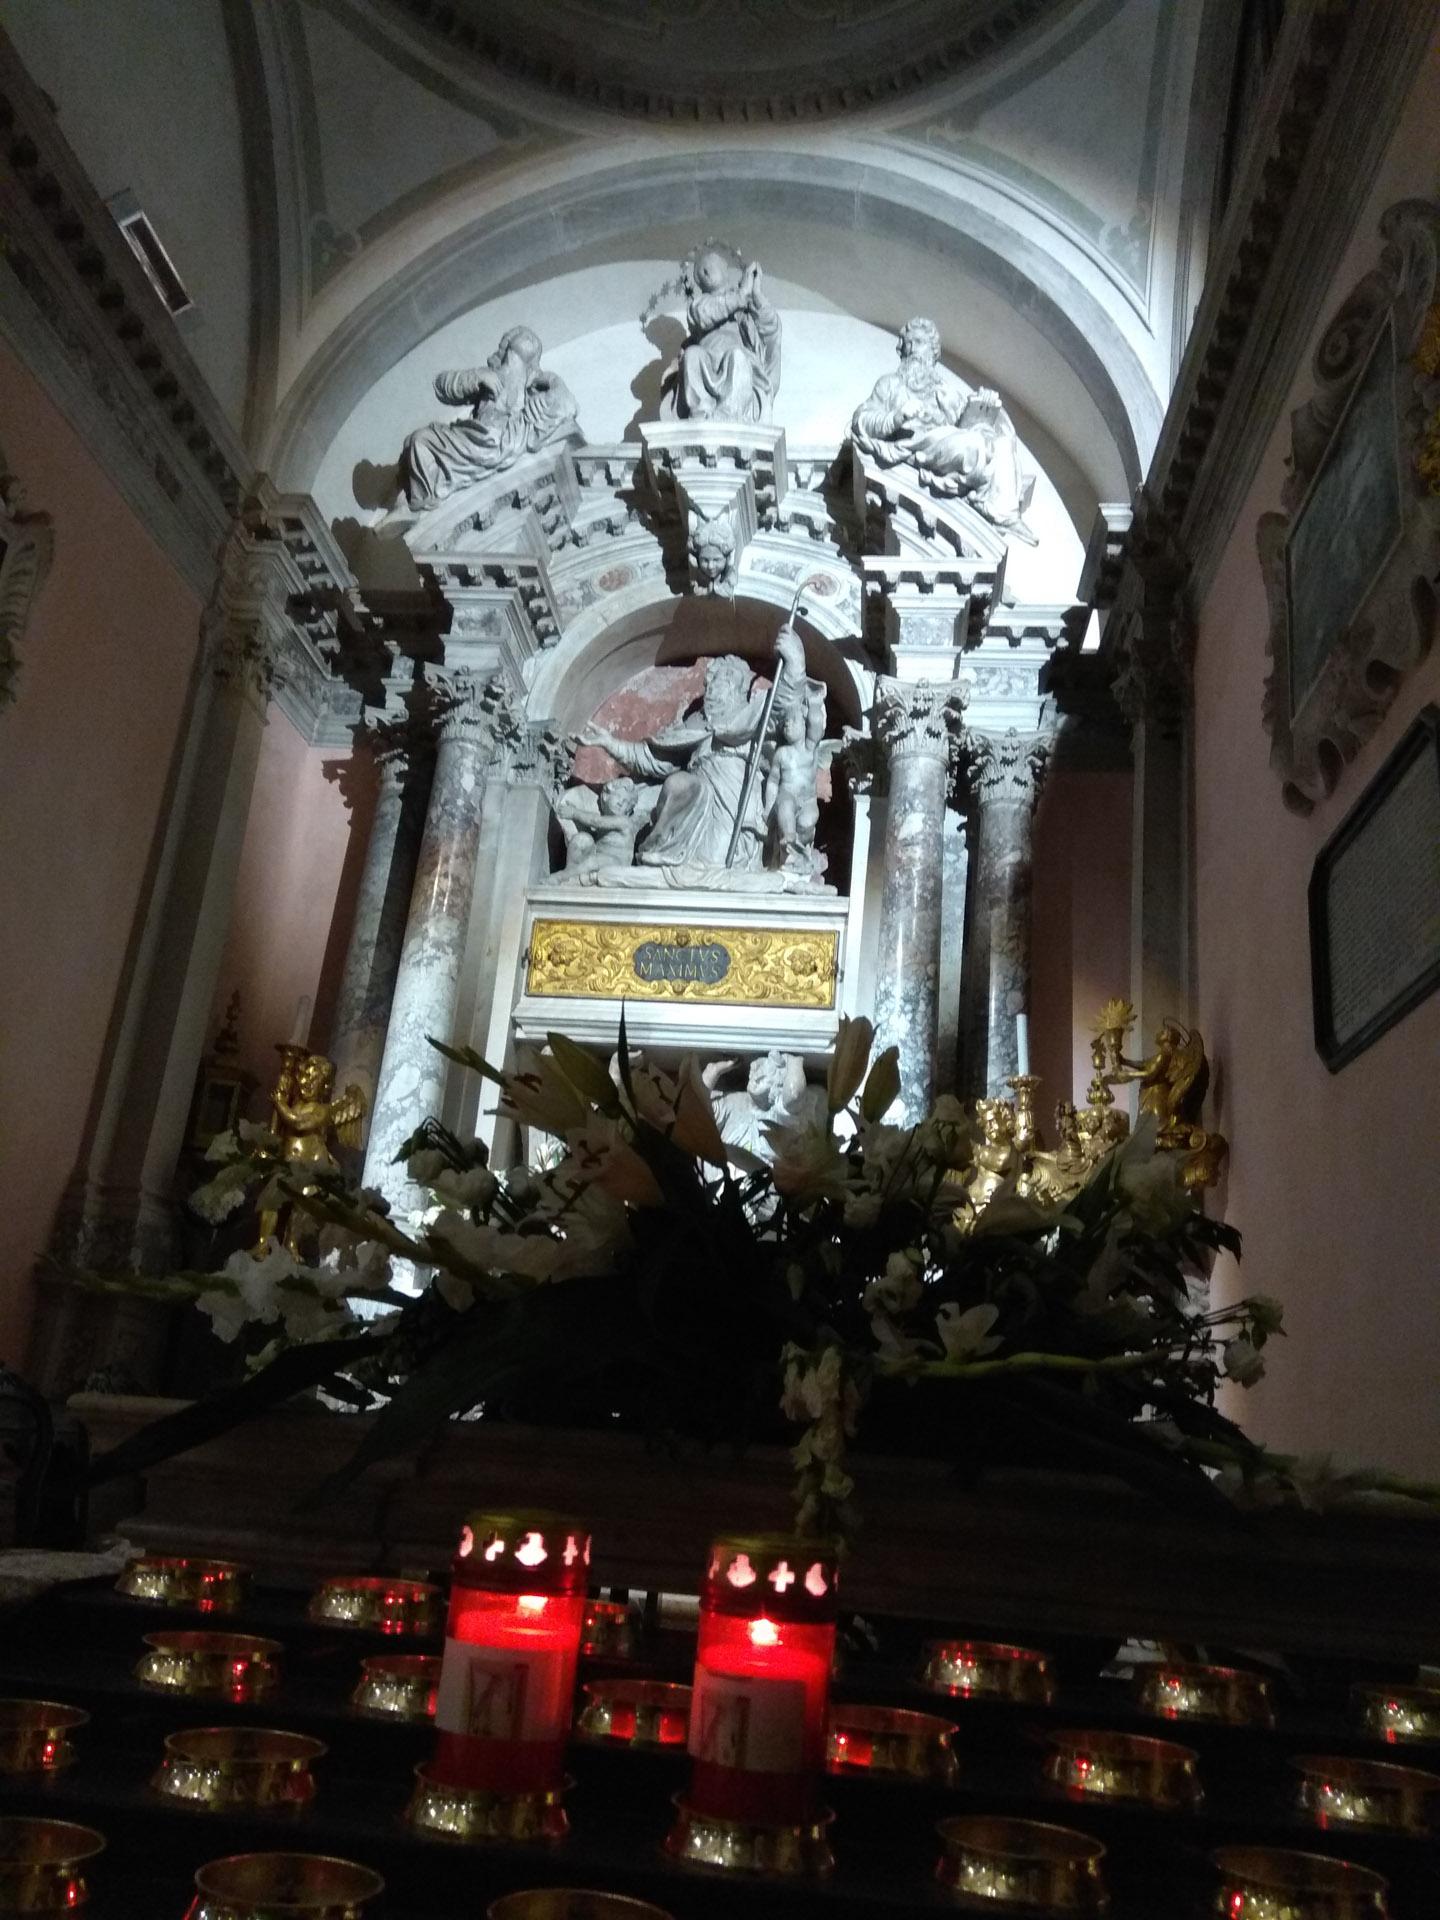 Chiesa San Canciano Venezia - Church of San Canciano Venice